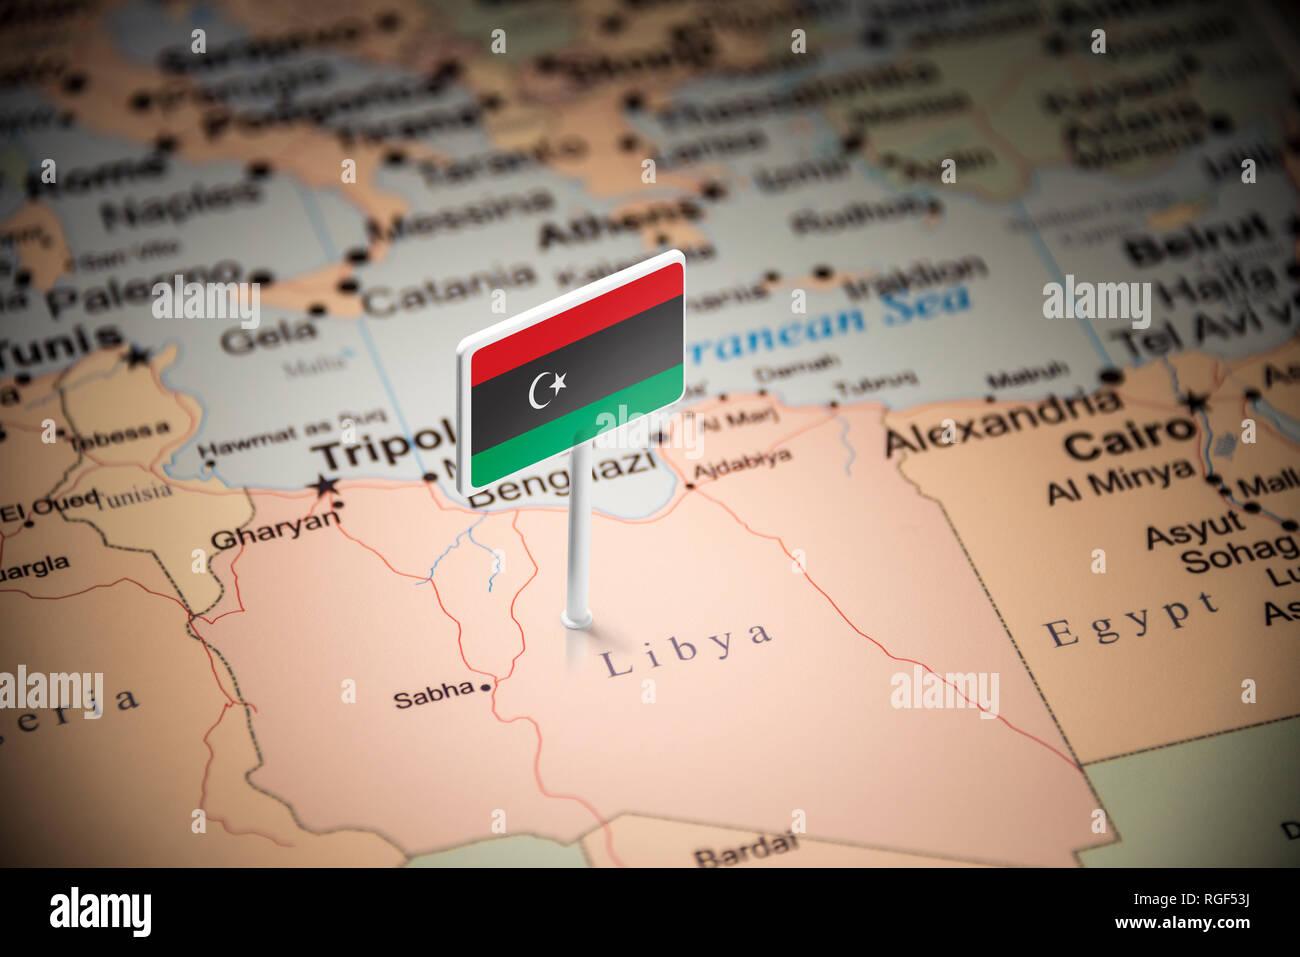 Libya Stock Photos & Libya Stock Images - Alamy